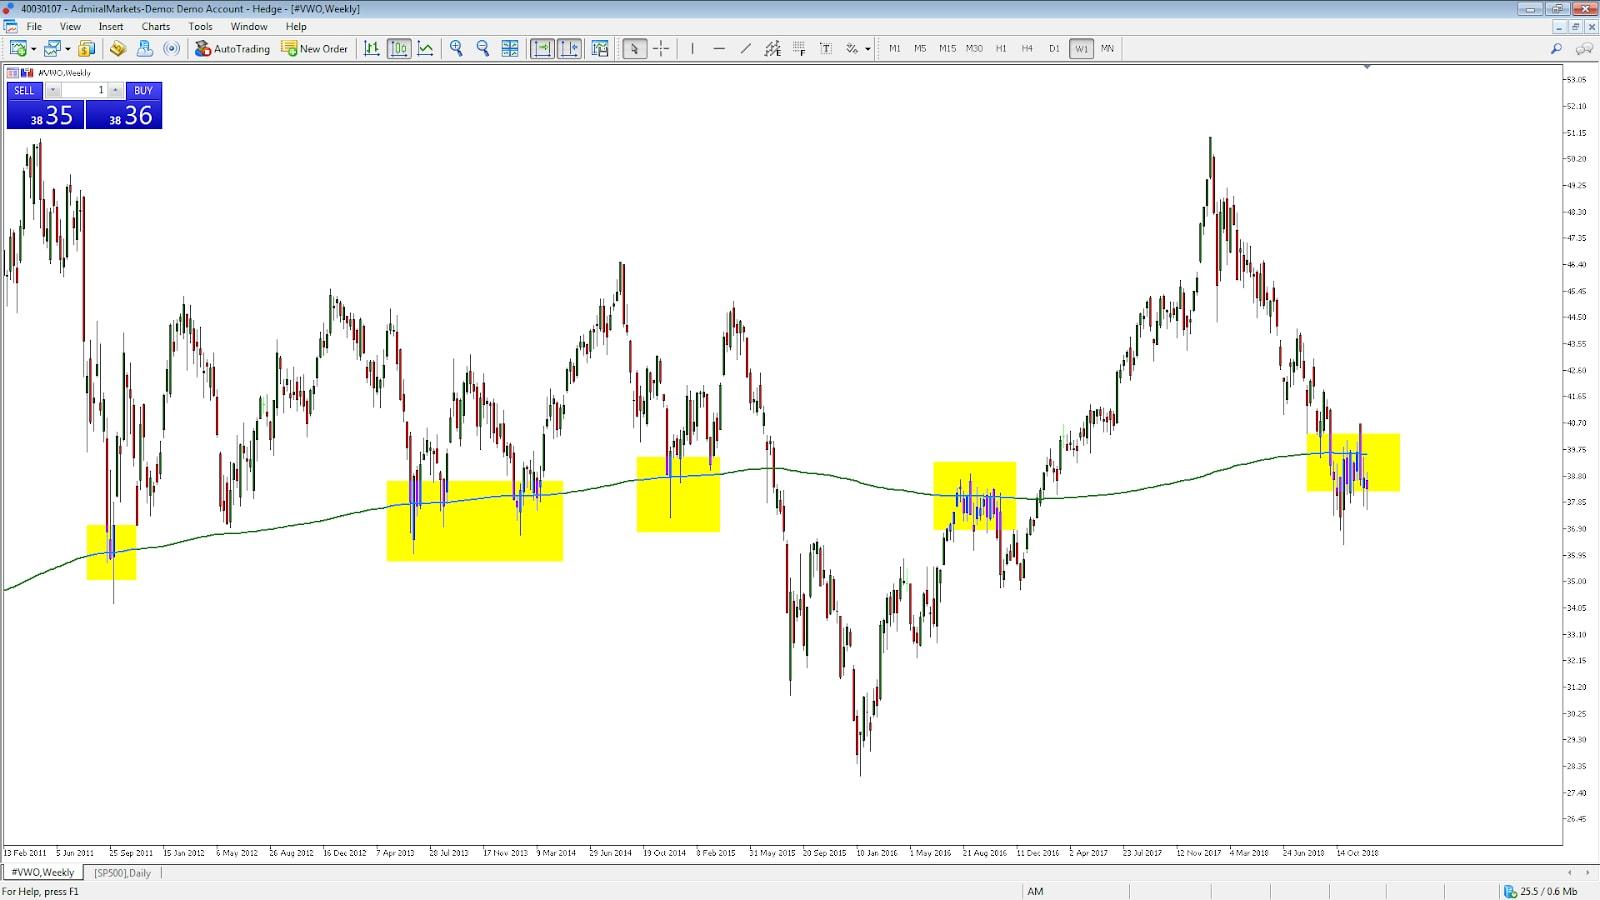 insam trading co inc